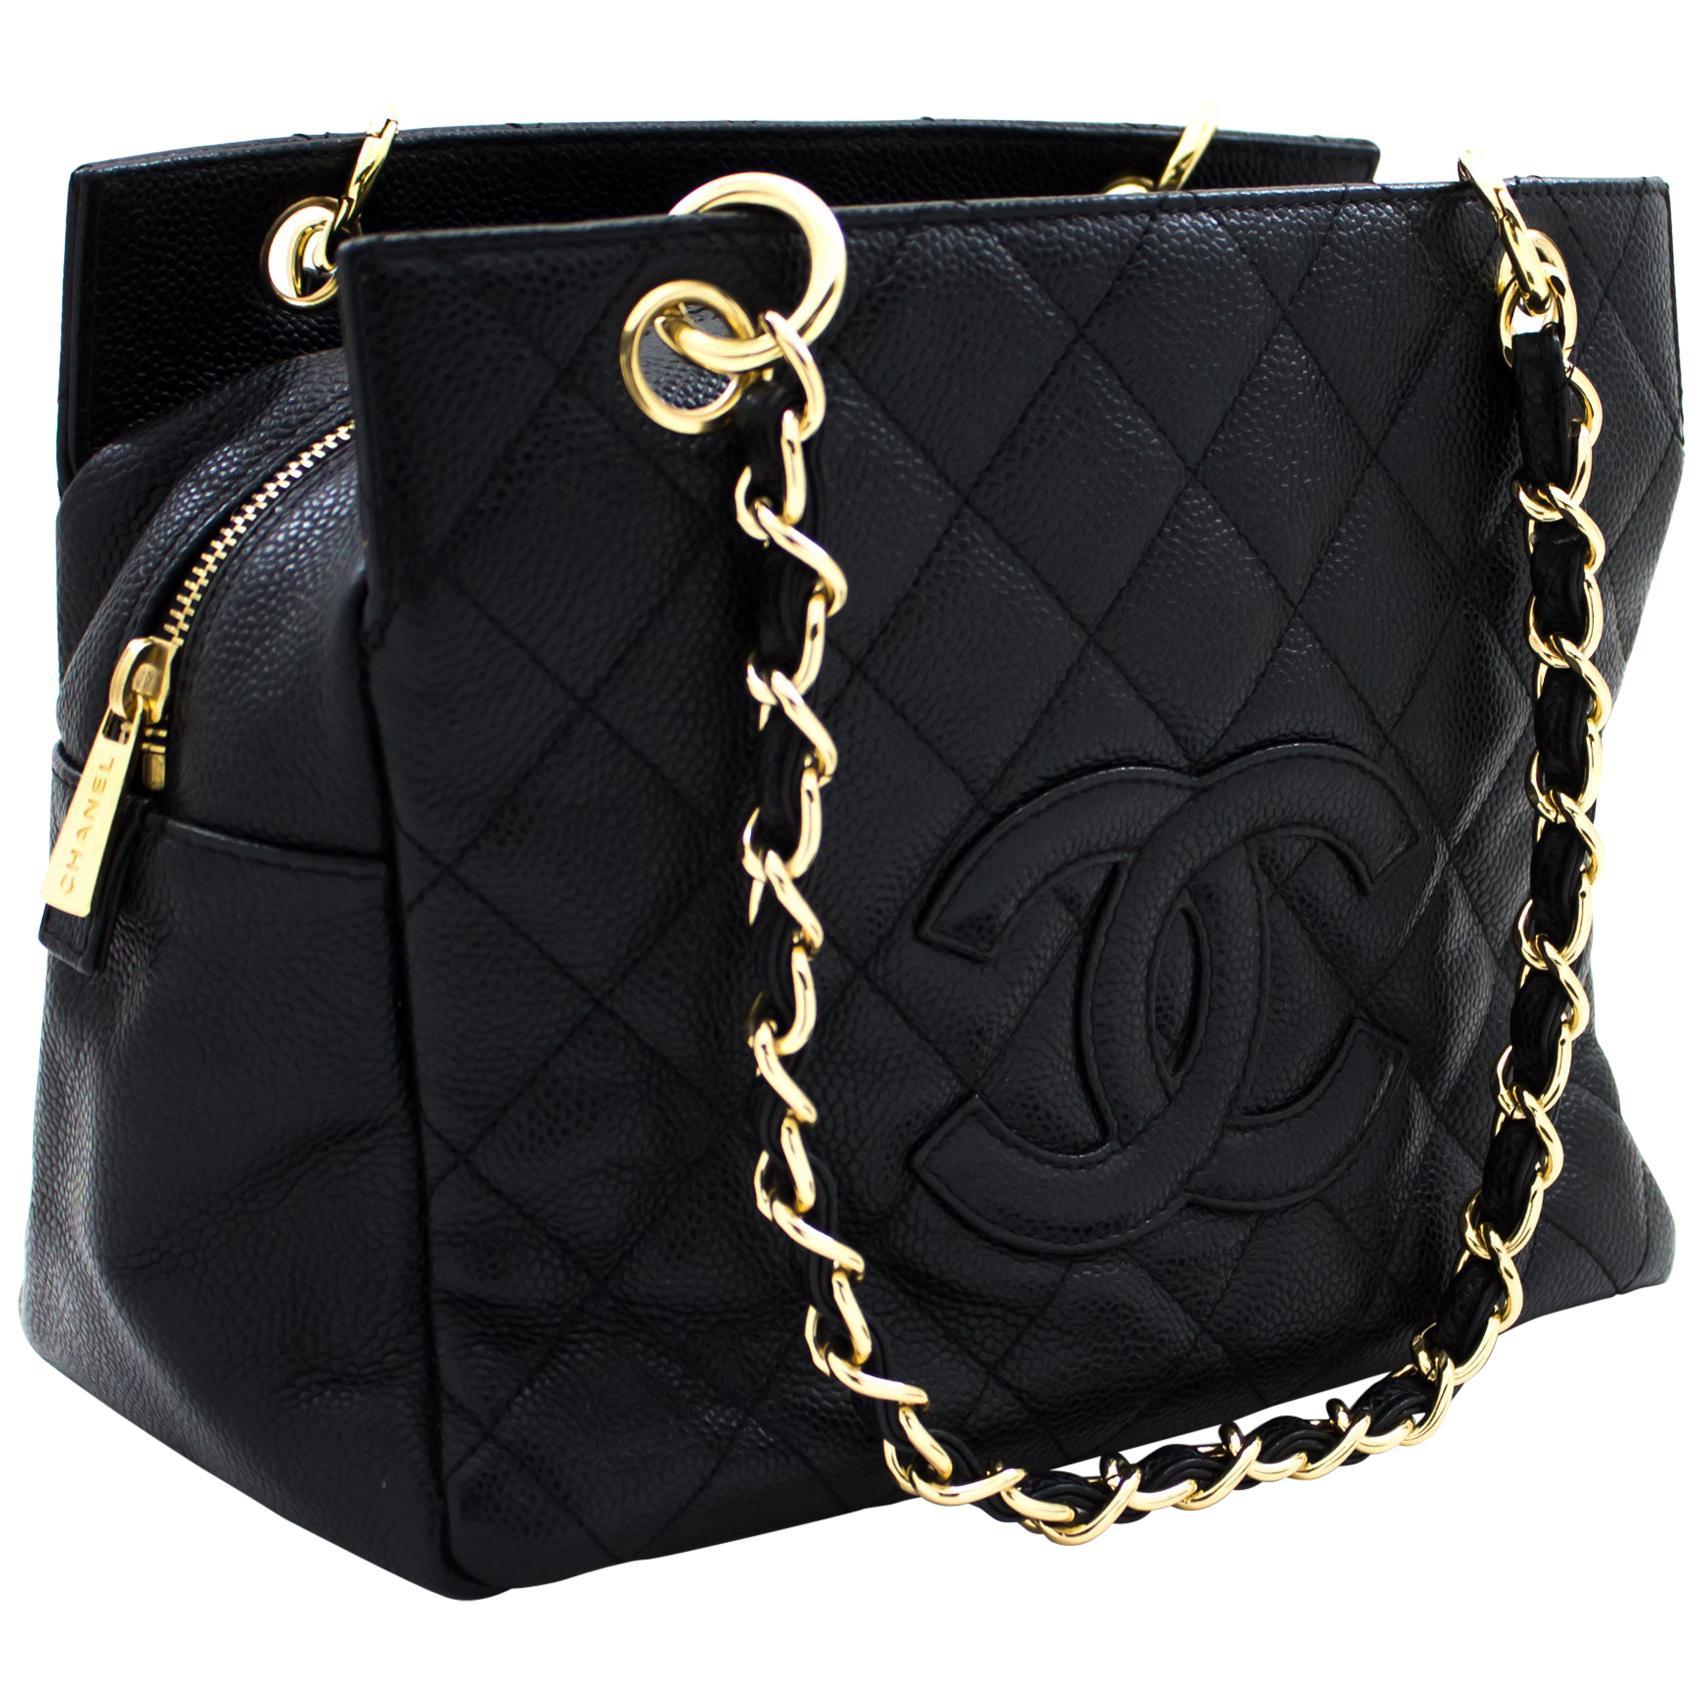 CHANEL Caviar Chain Shoulder Shopping Tote